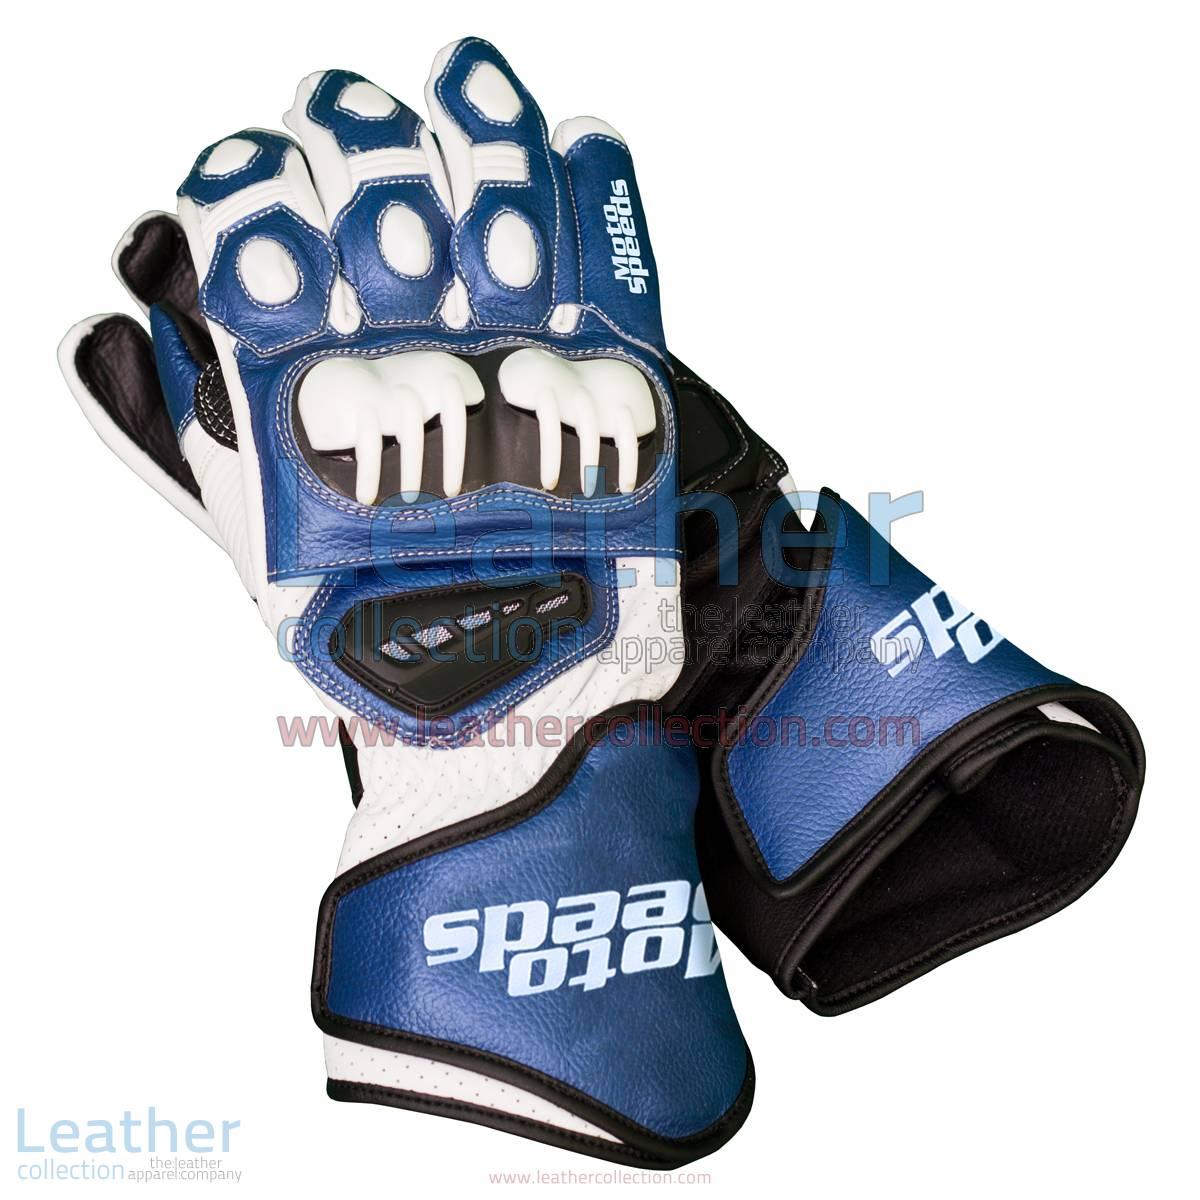 Blue & White Leather Biker Gloves | biker gloves,leather biker gloves